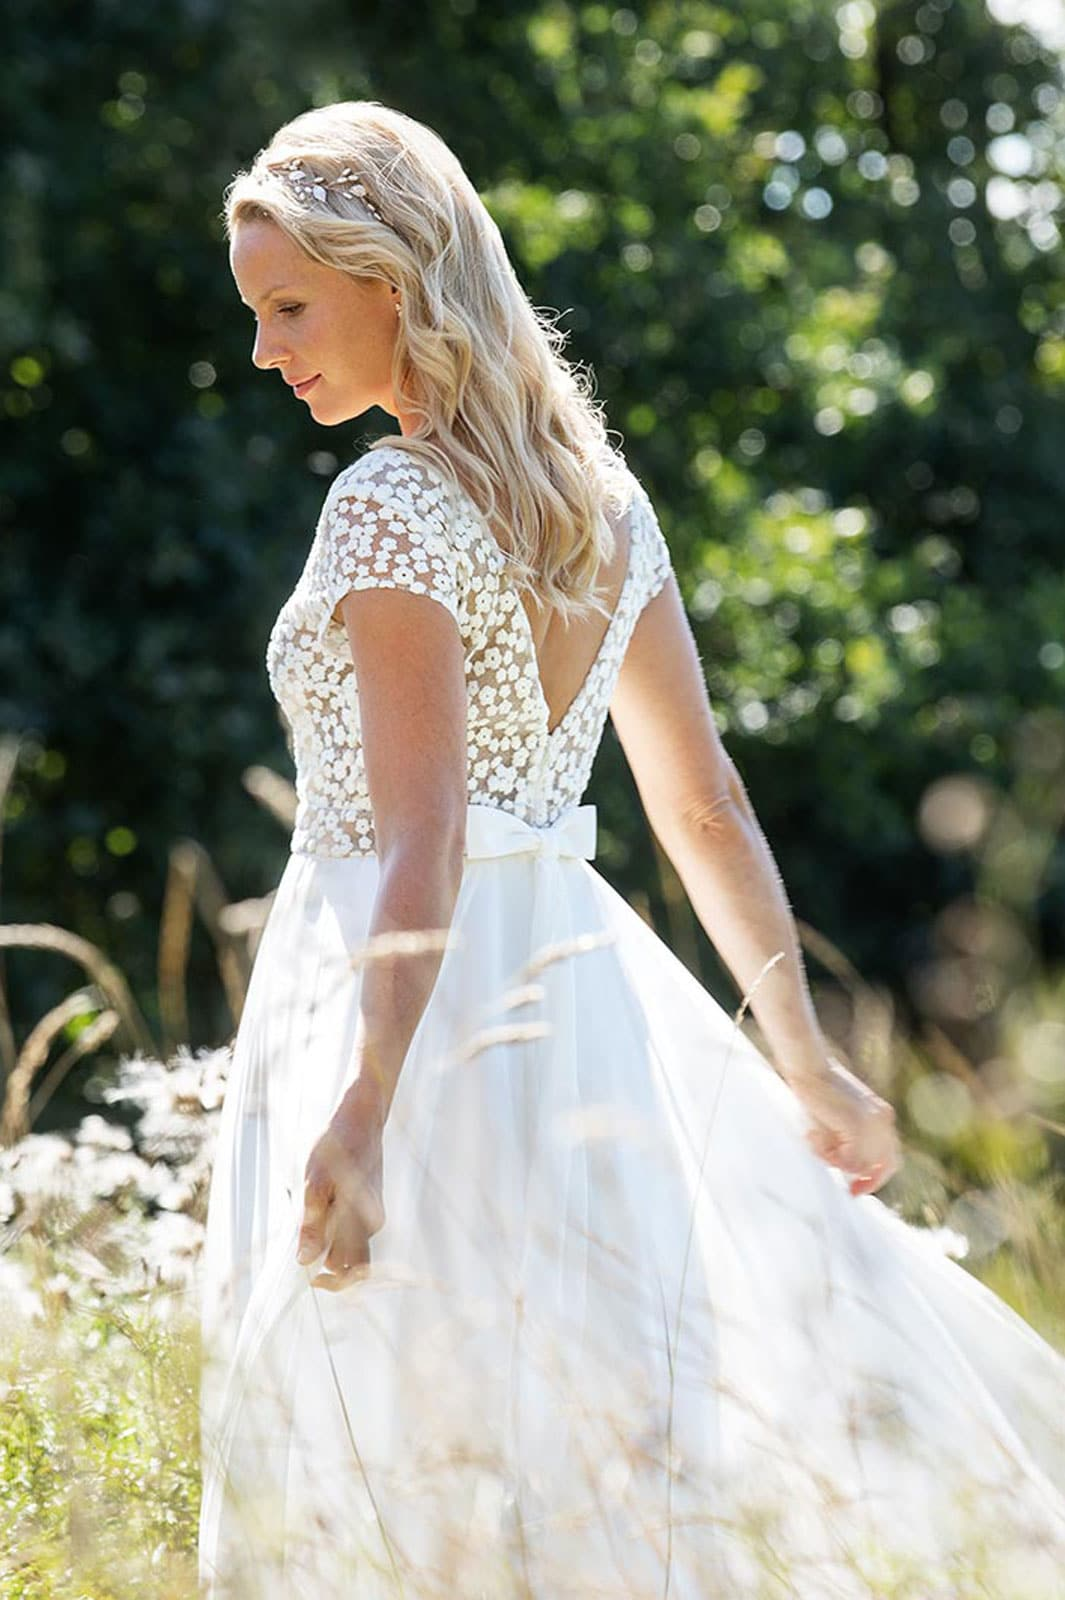 Brautkleid Blütenspitze V-Ausschnitt Chiffonrock